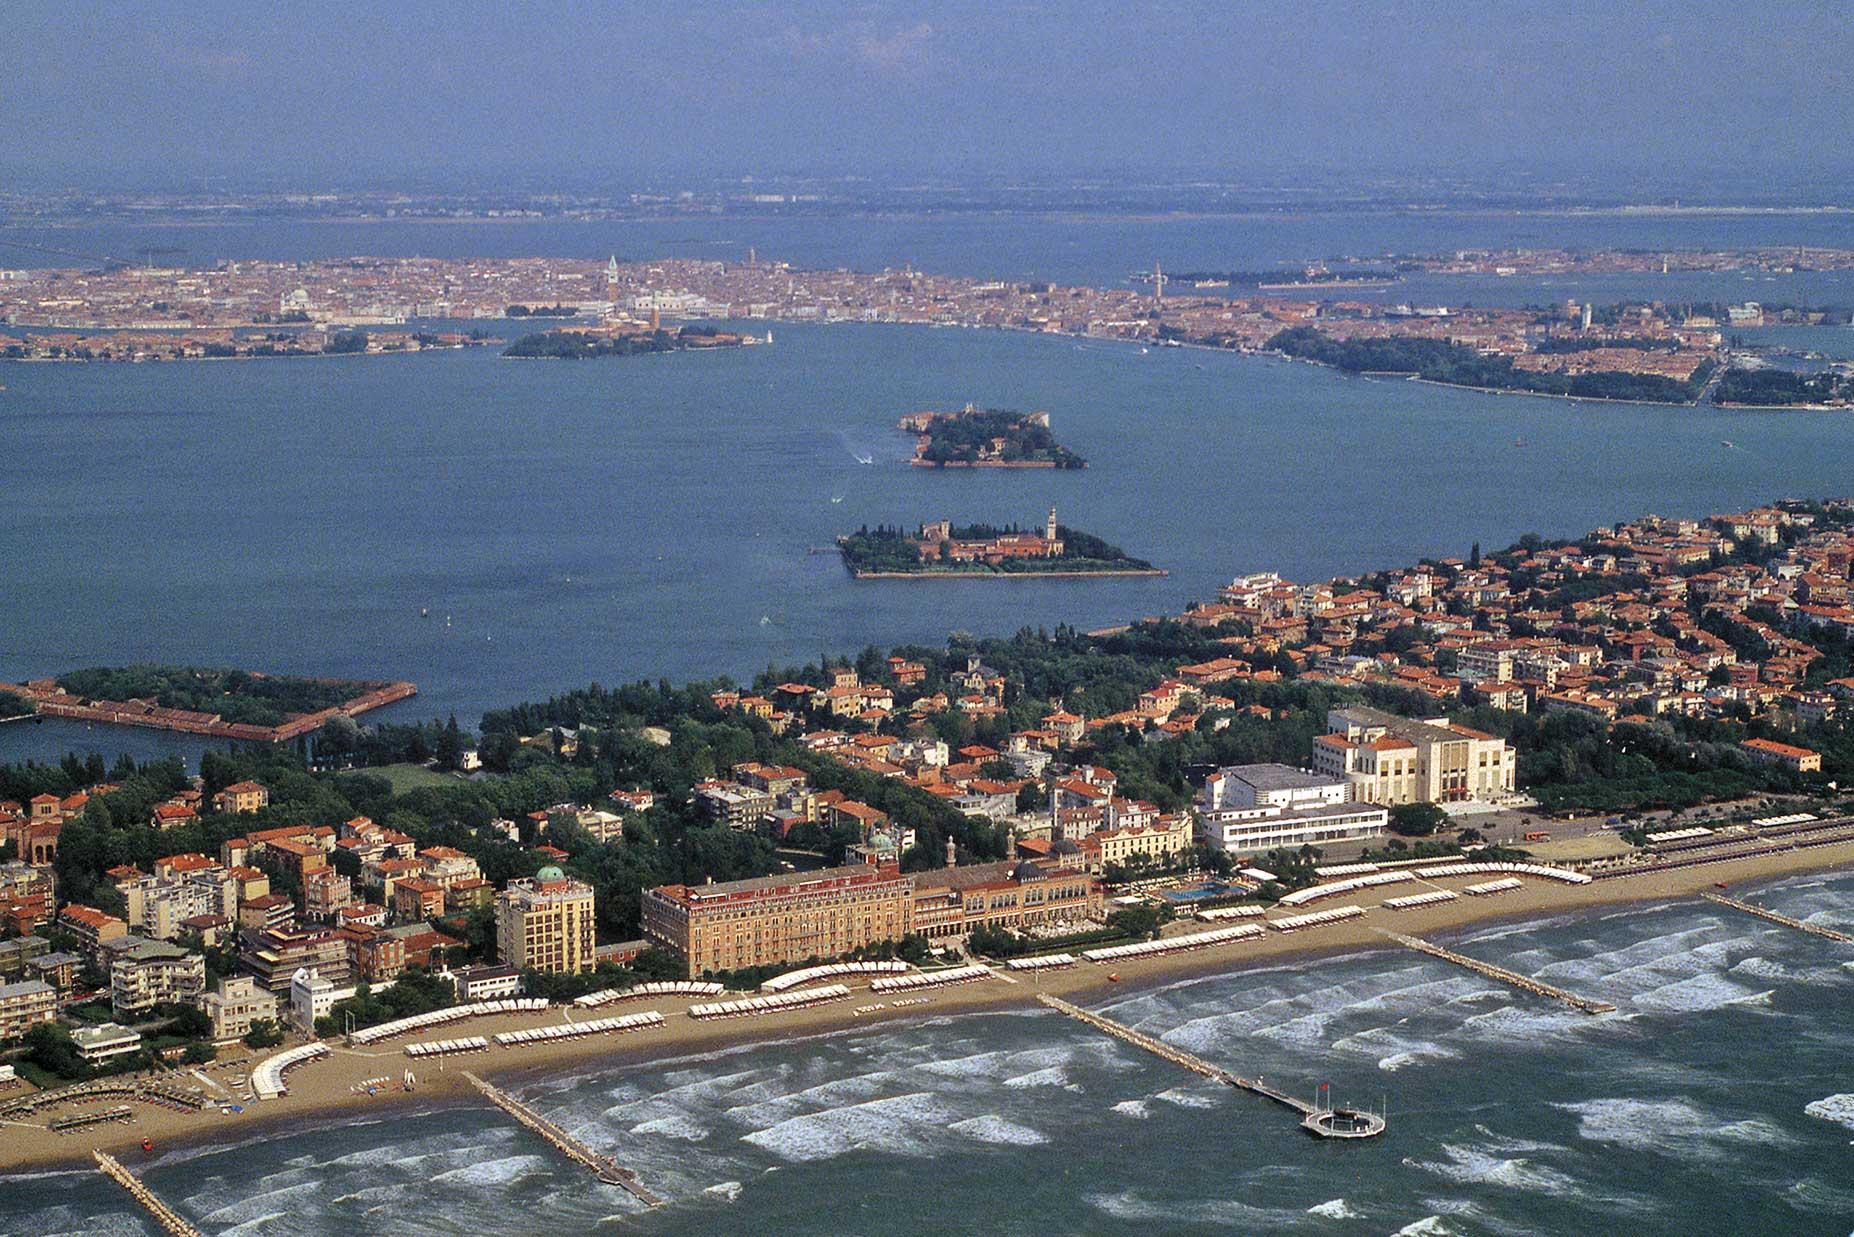 https://i0.wp.com/bur.regione.veneto.it/resourcegallery/photos/424_Venezia_ve_Lido%20e%20isole%20minori.jpg